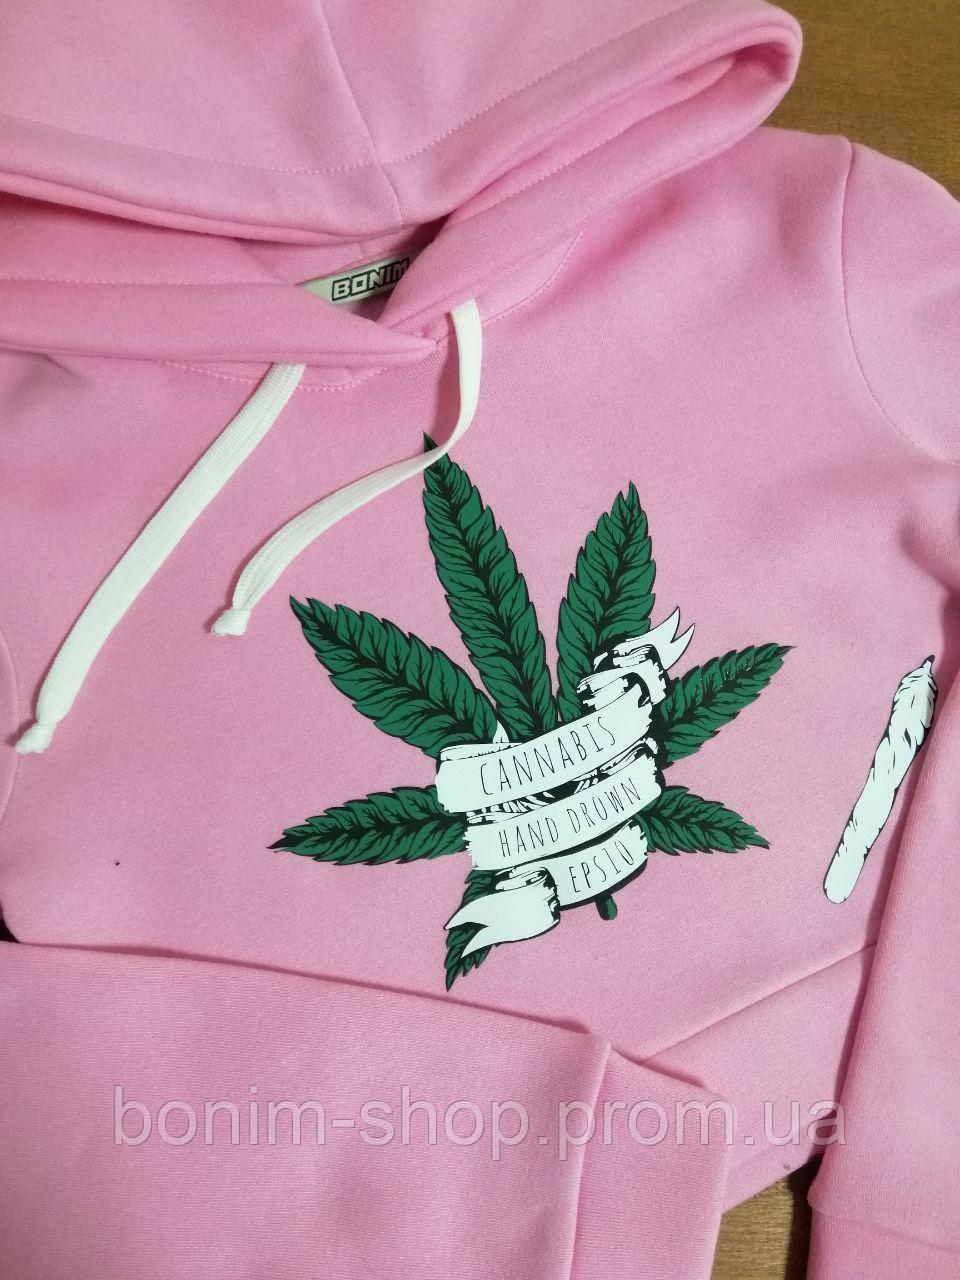 Розовый короткий худи